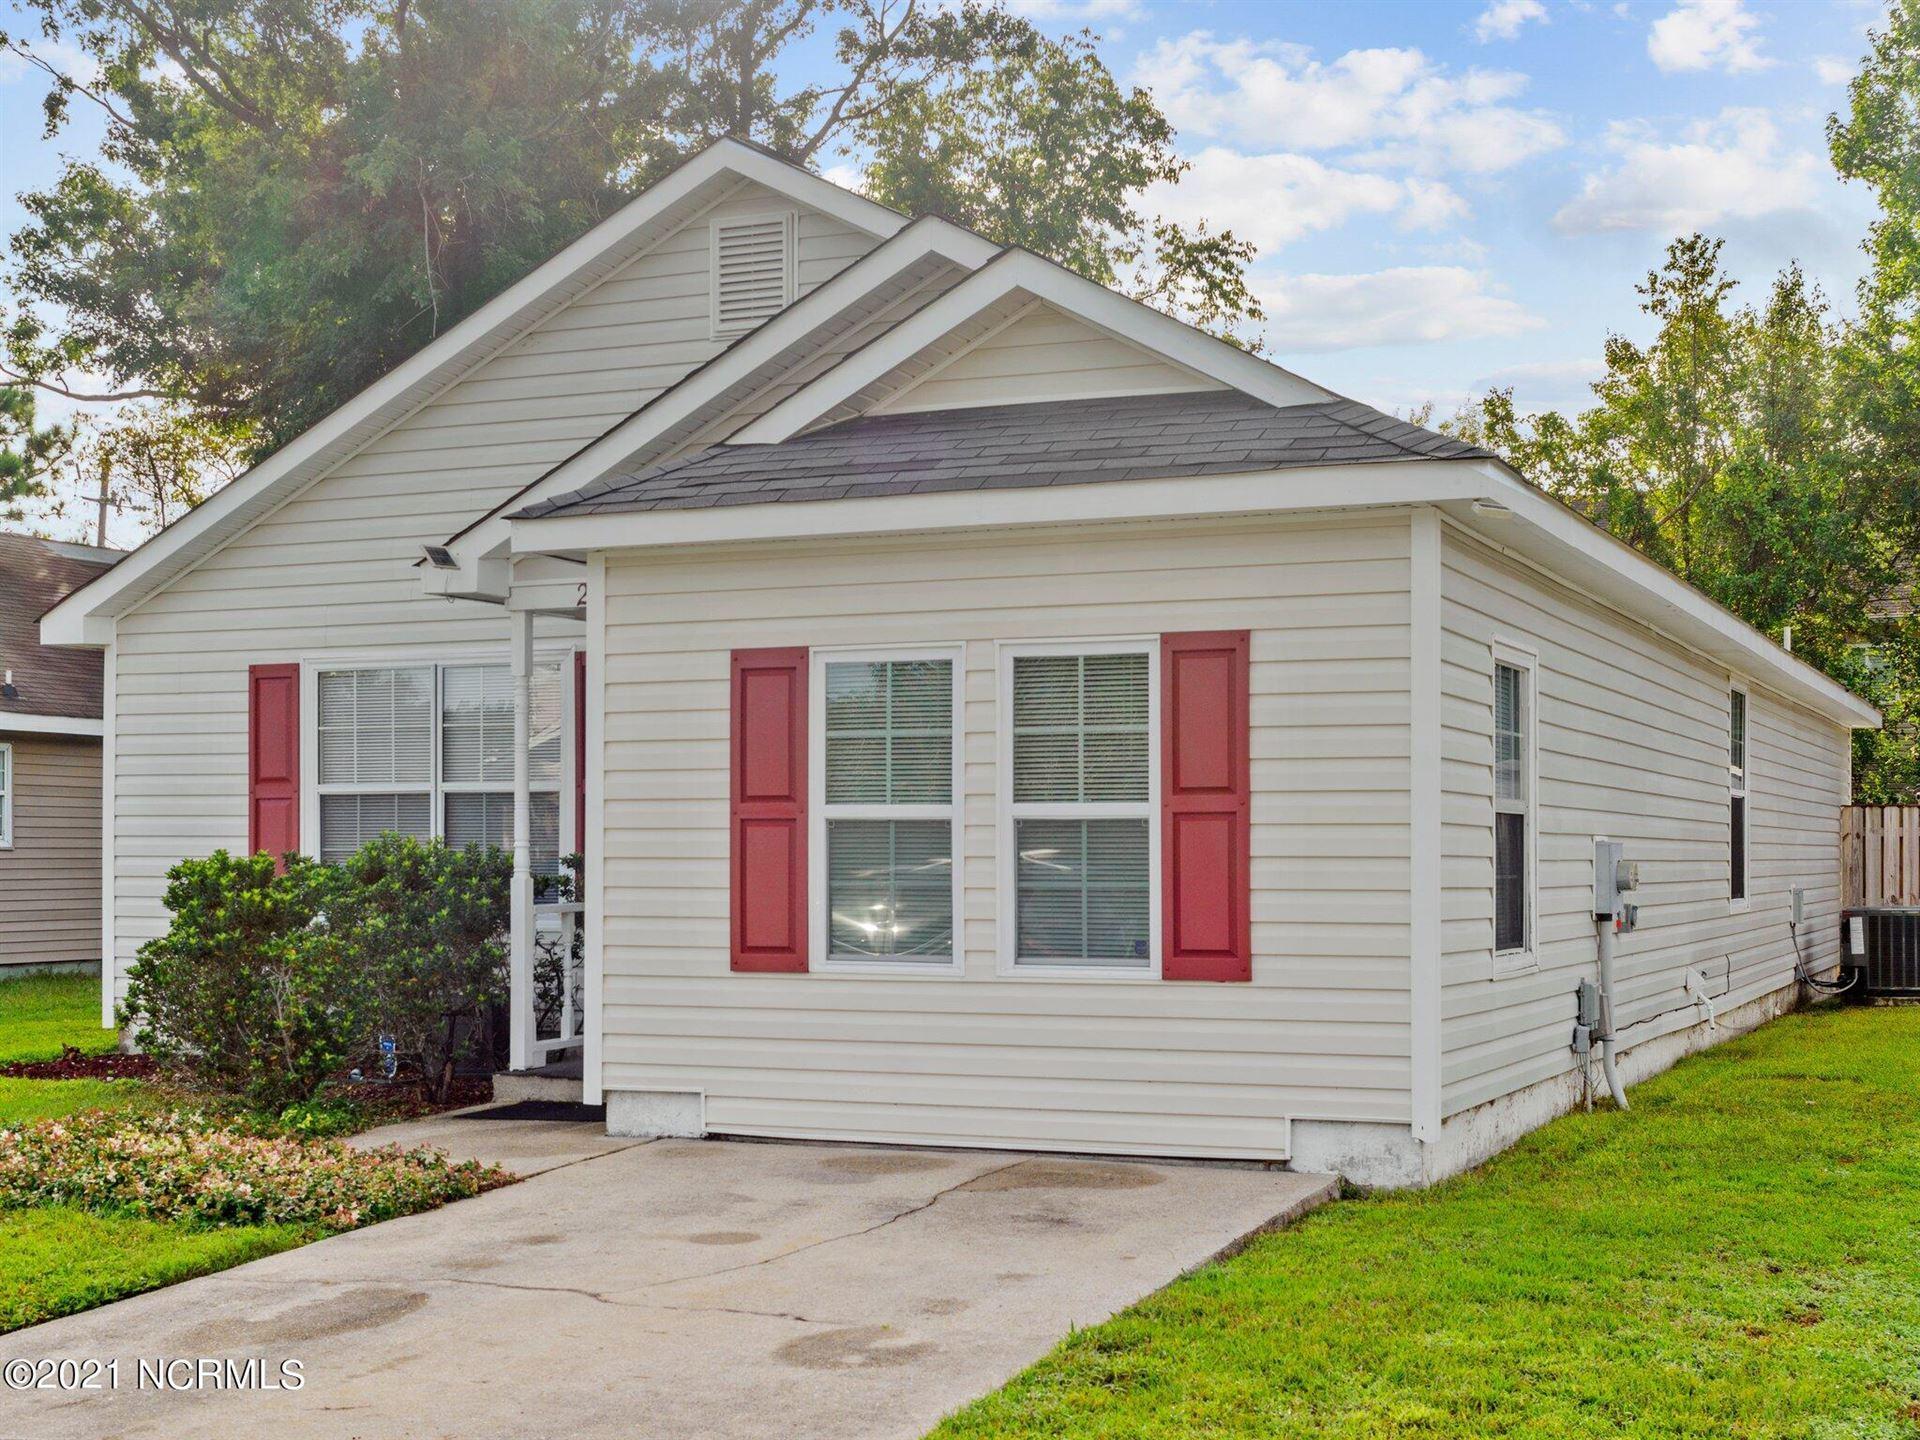 Photo of 2046 Foxhorn Road, Jacksonville, NC 28546 (MLS # 100292601)